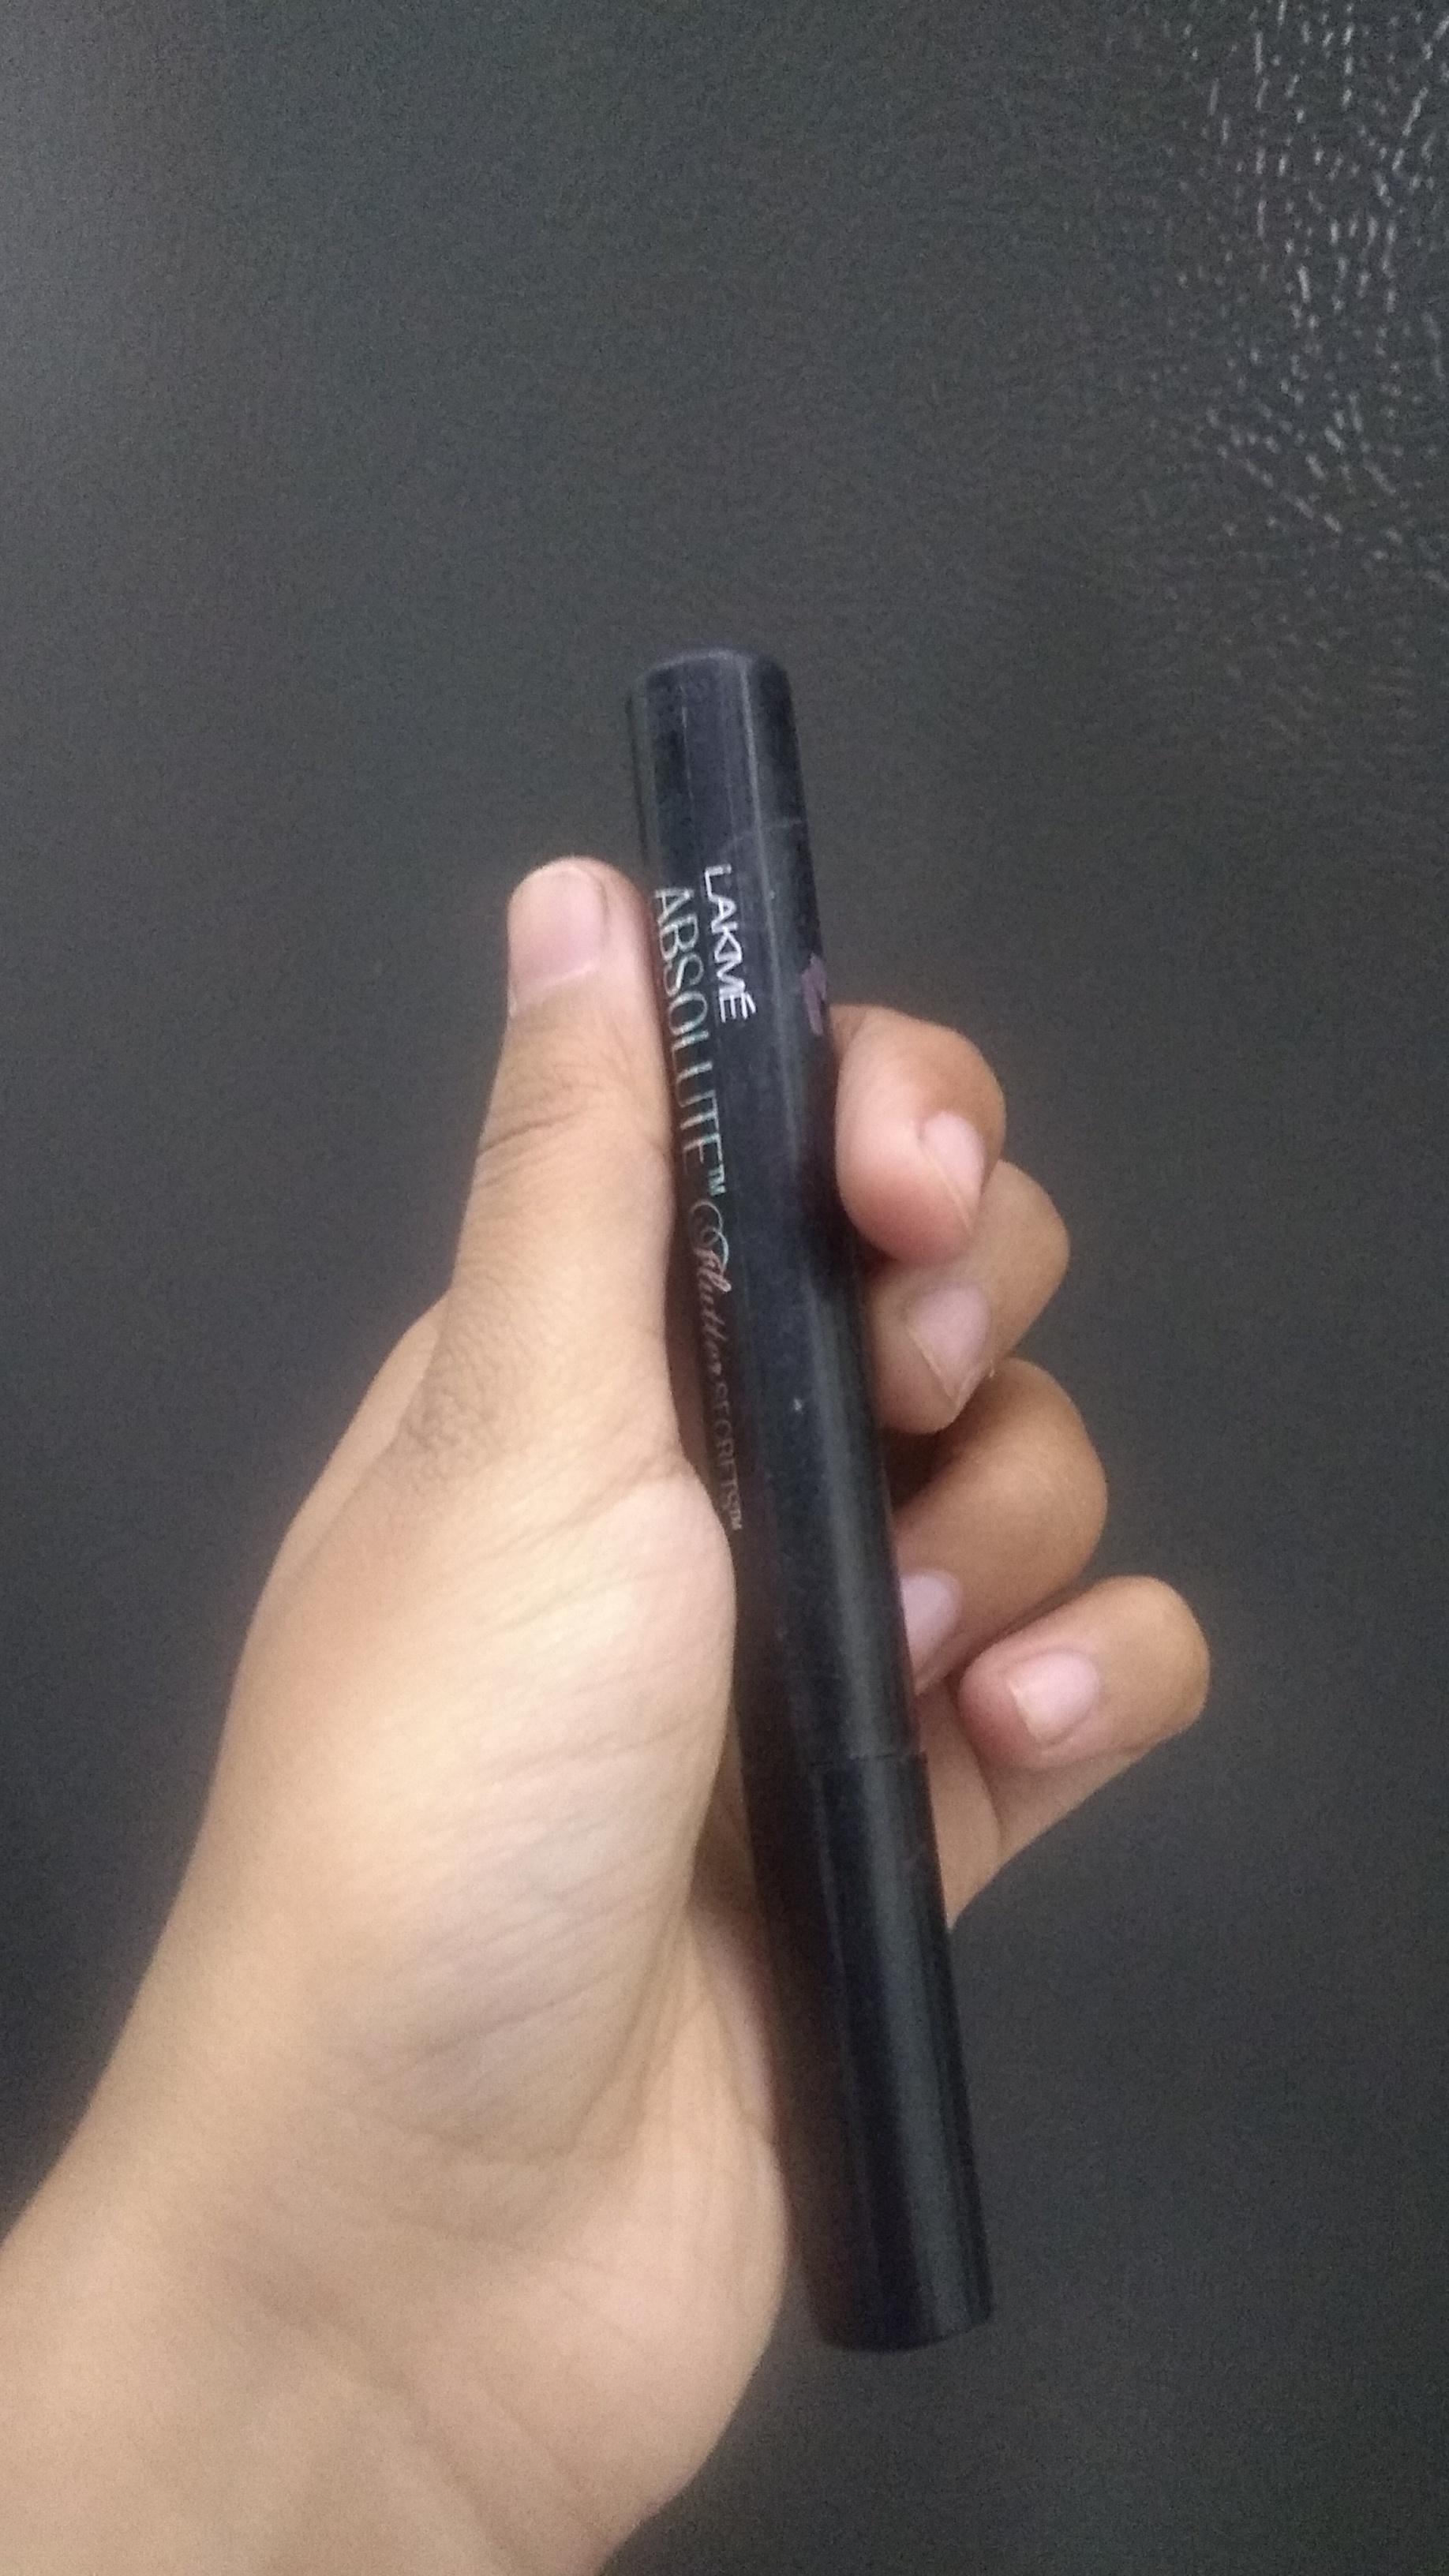 Lakme Absolute Shine Liquid Eyeliner-Gives a shiney finish-By lilgirl27